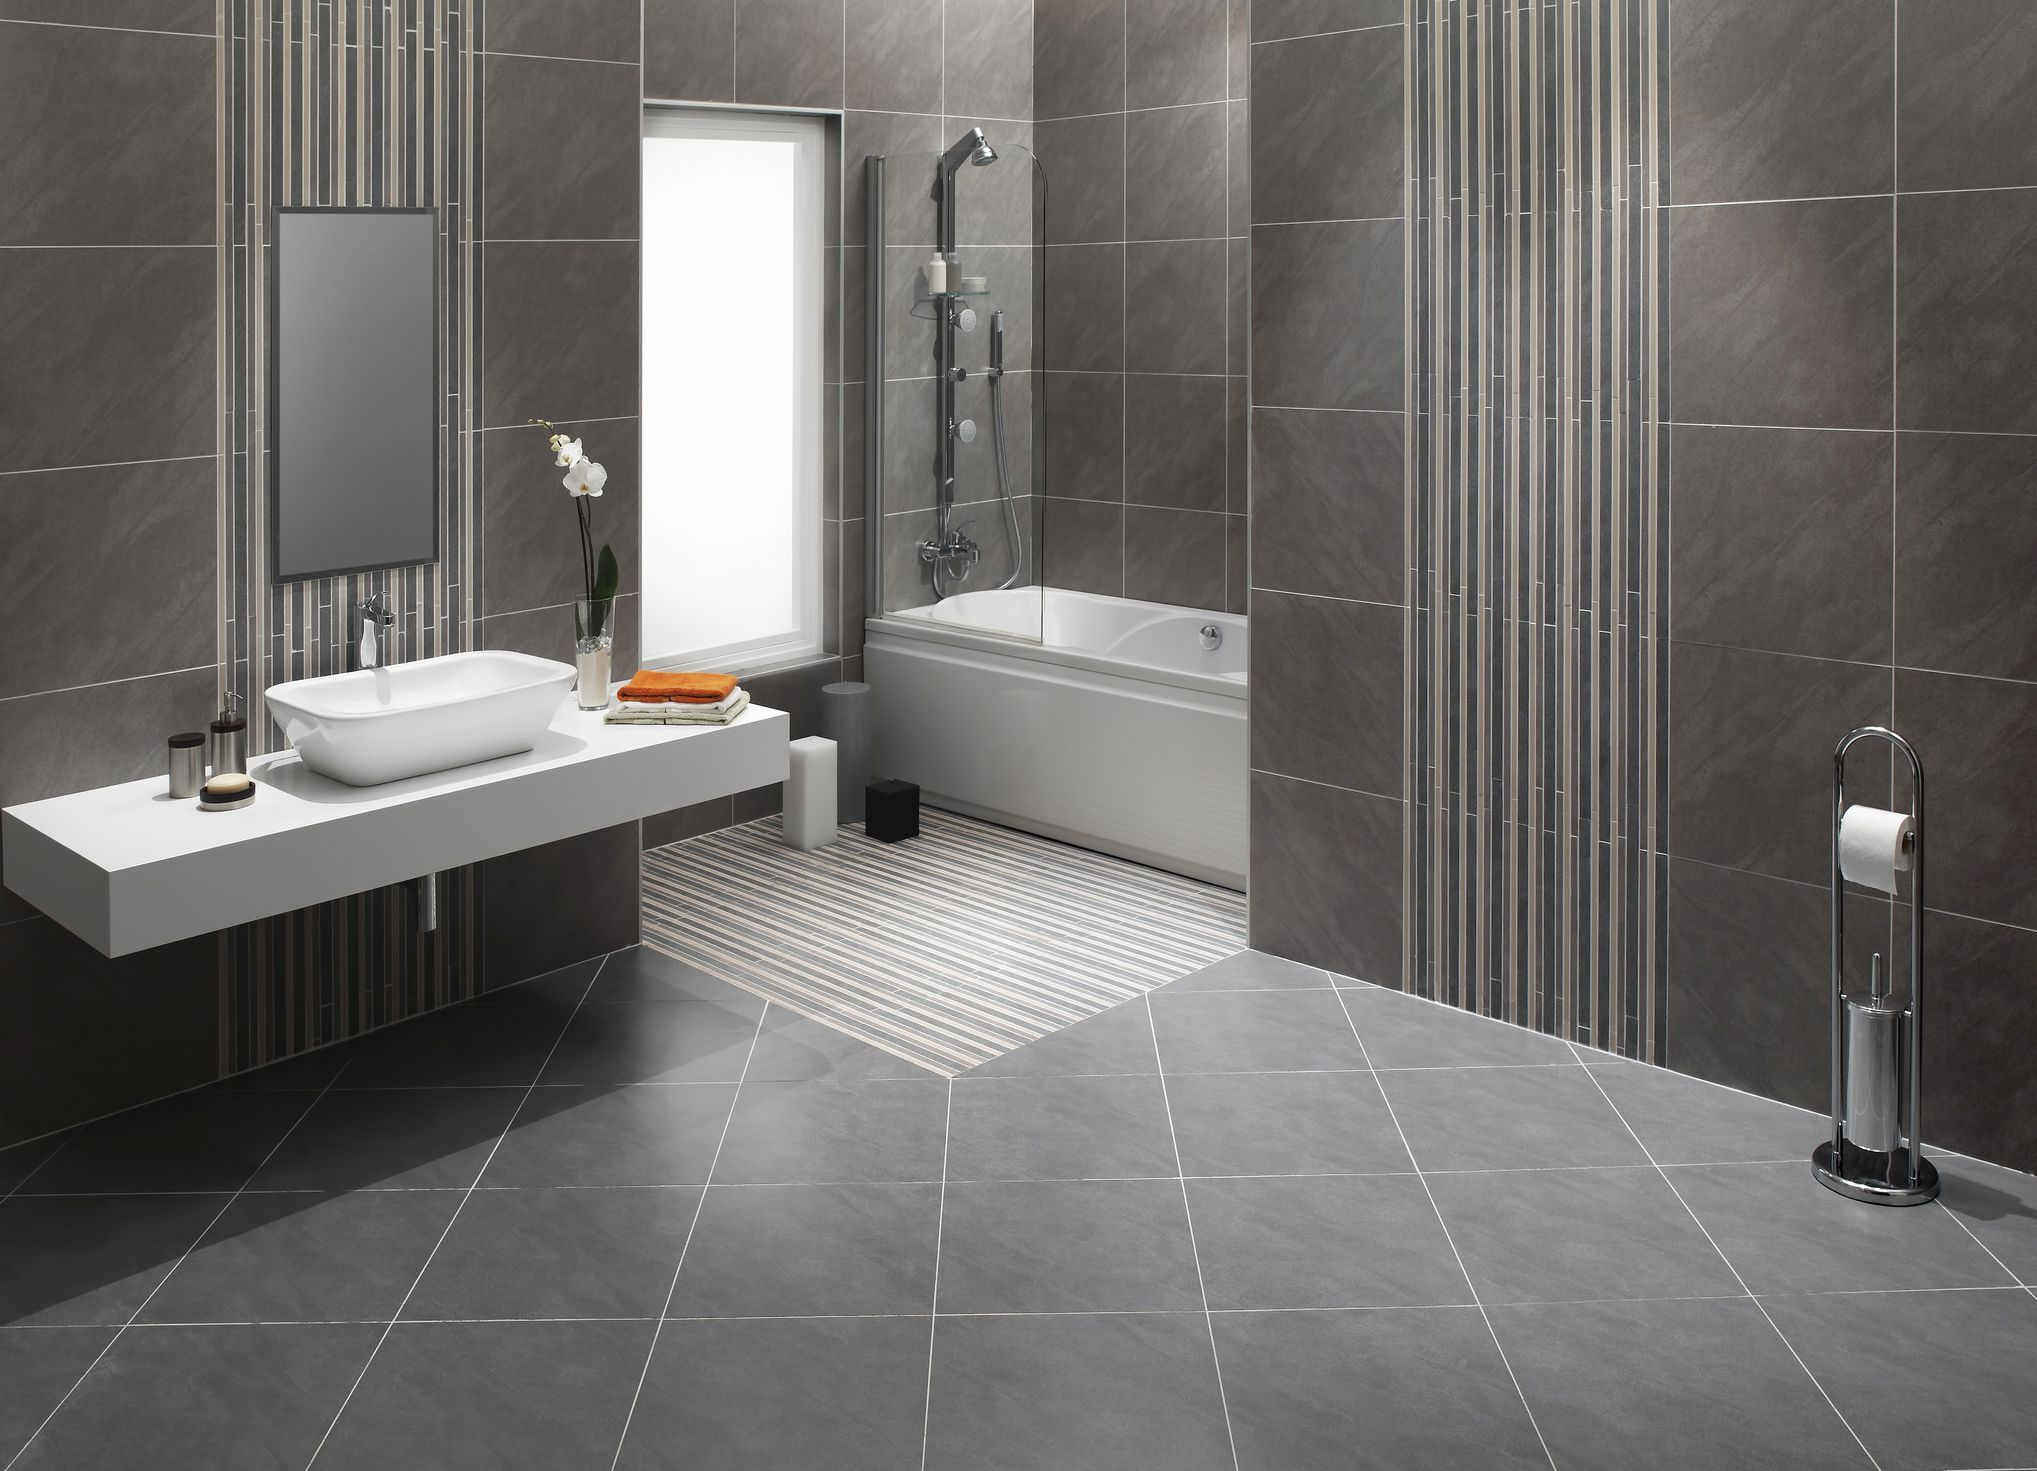 Advantages Of A Diagonal Tile Layout For A Bathroom Floor